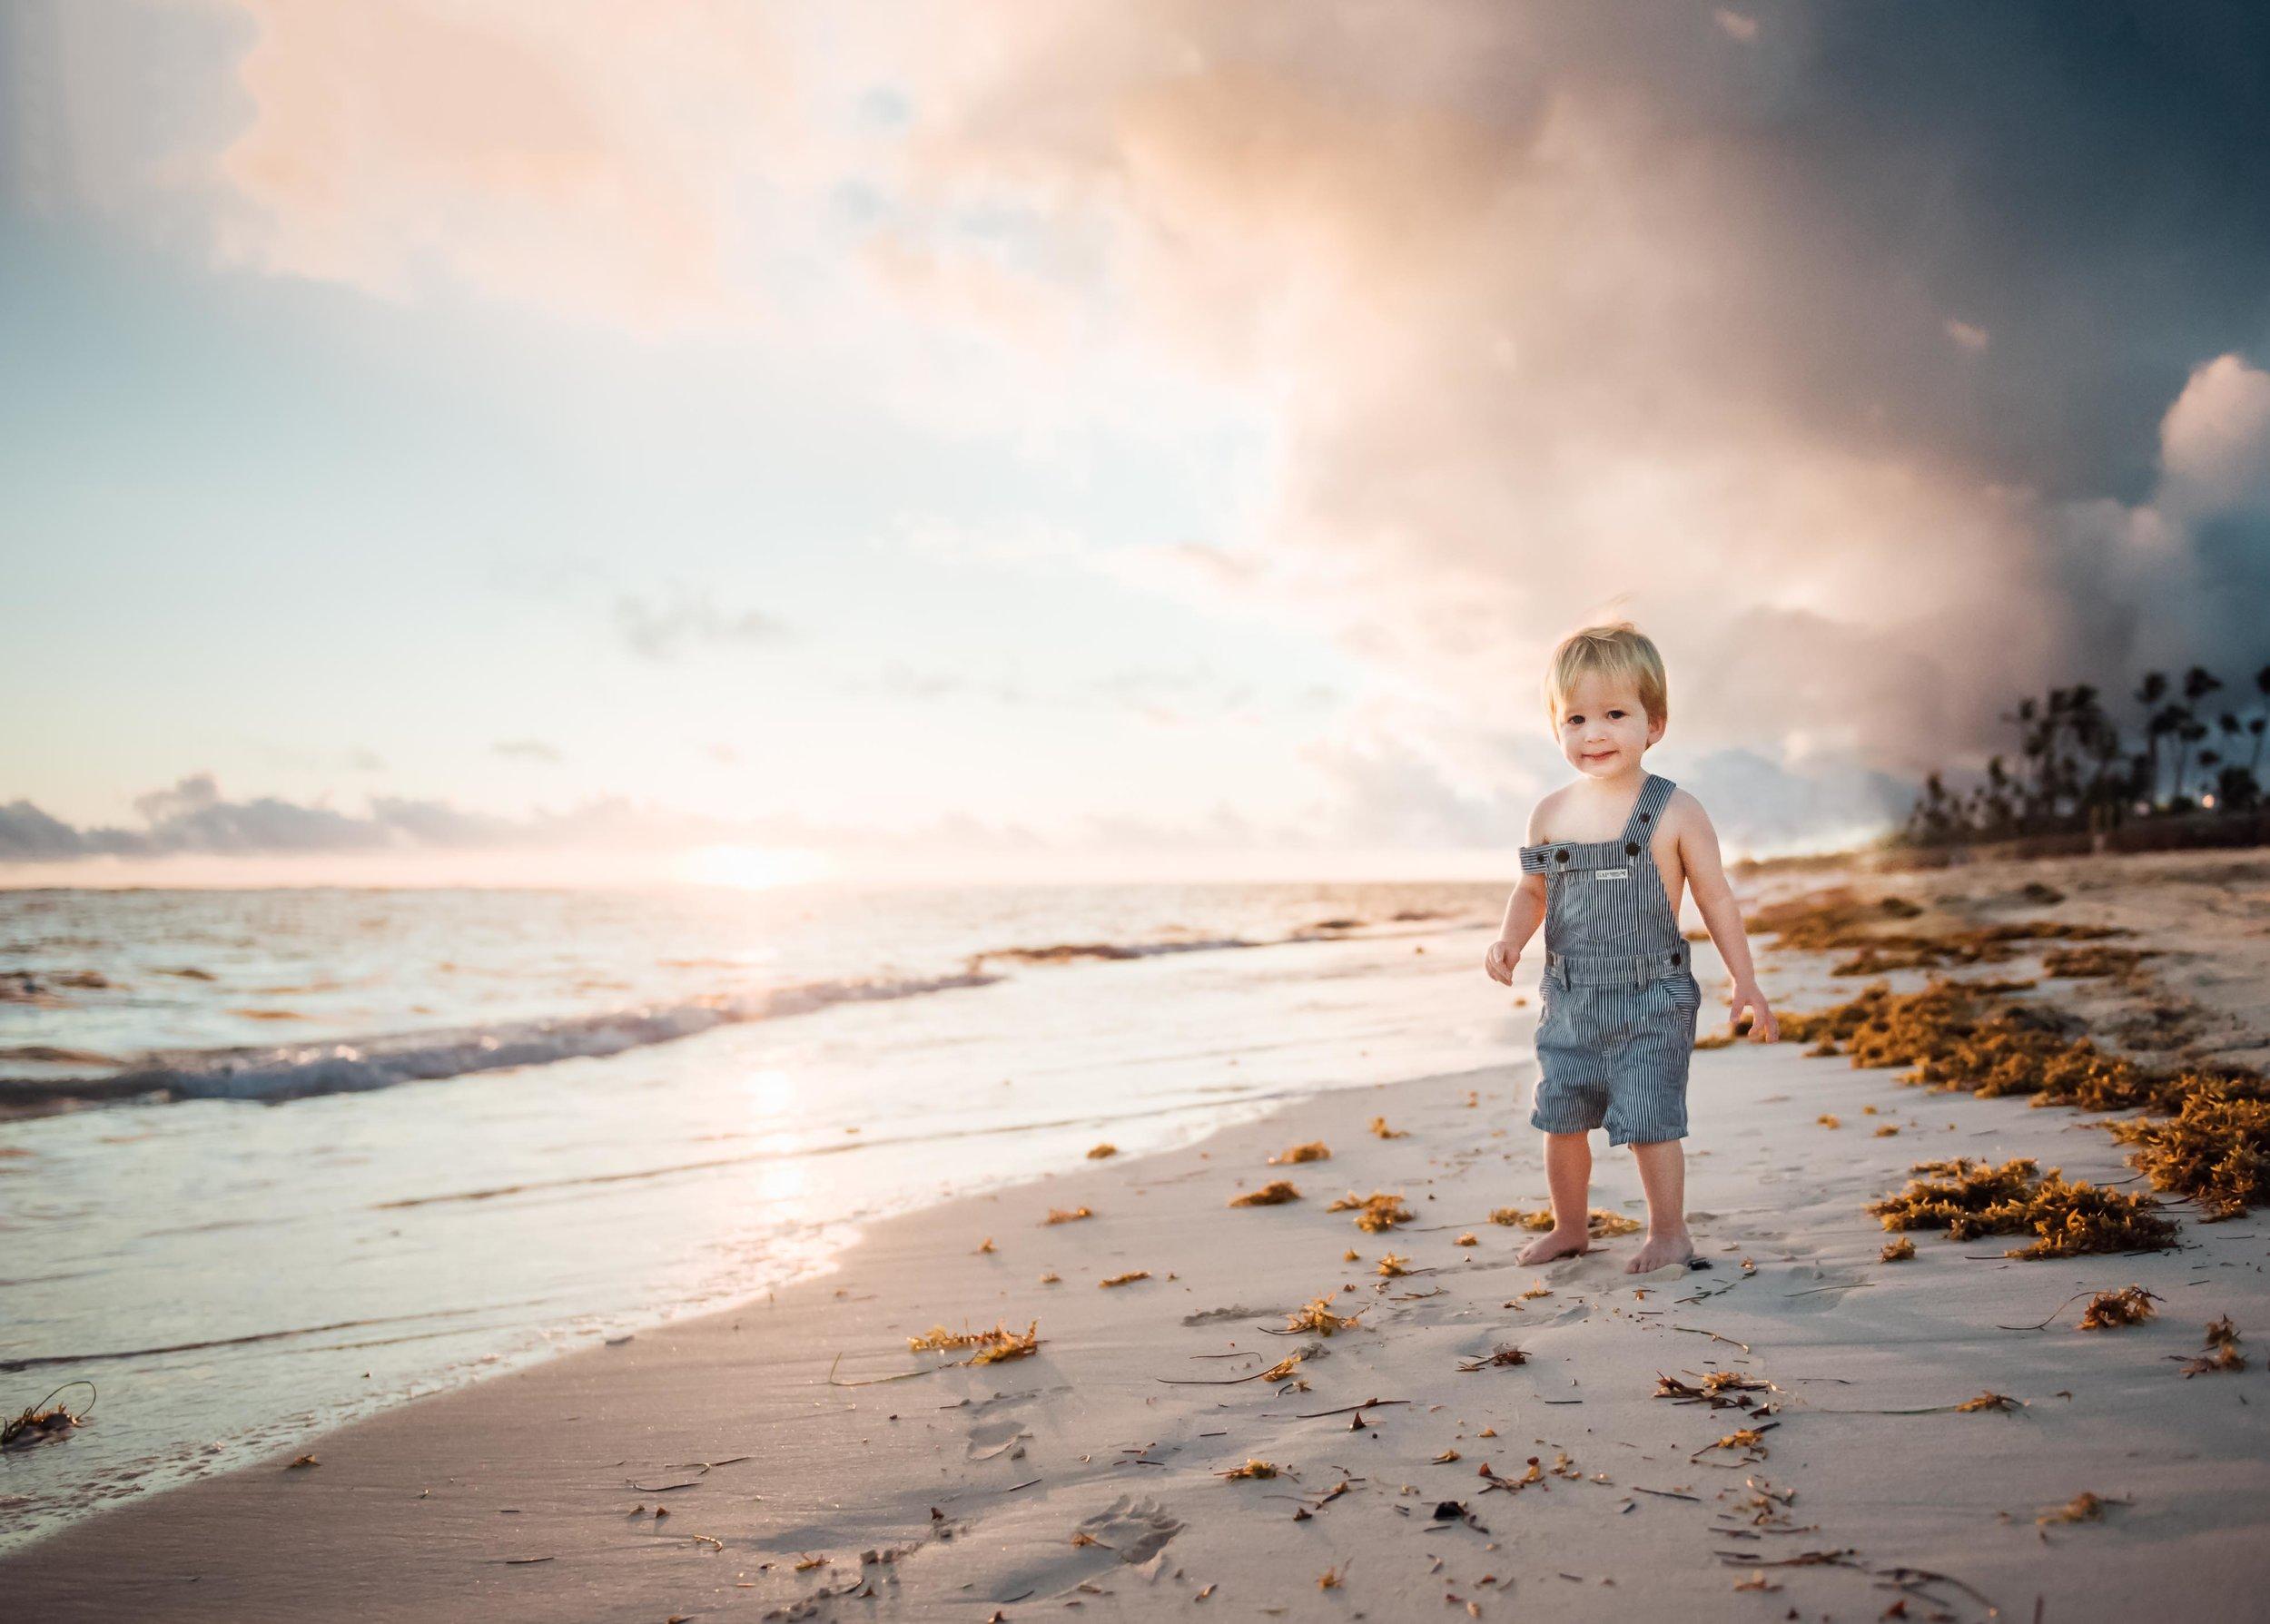 baby walking on beach at sunset - Niagara baby photographer